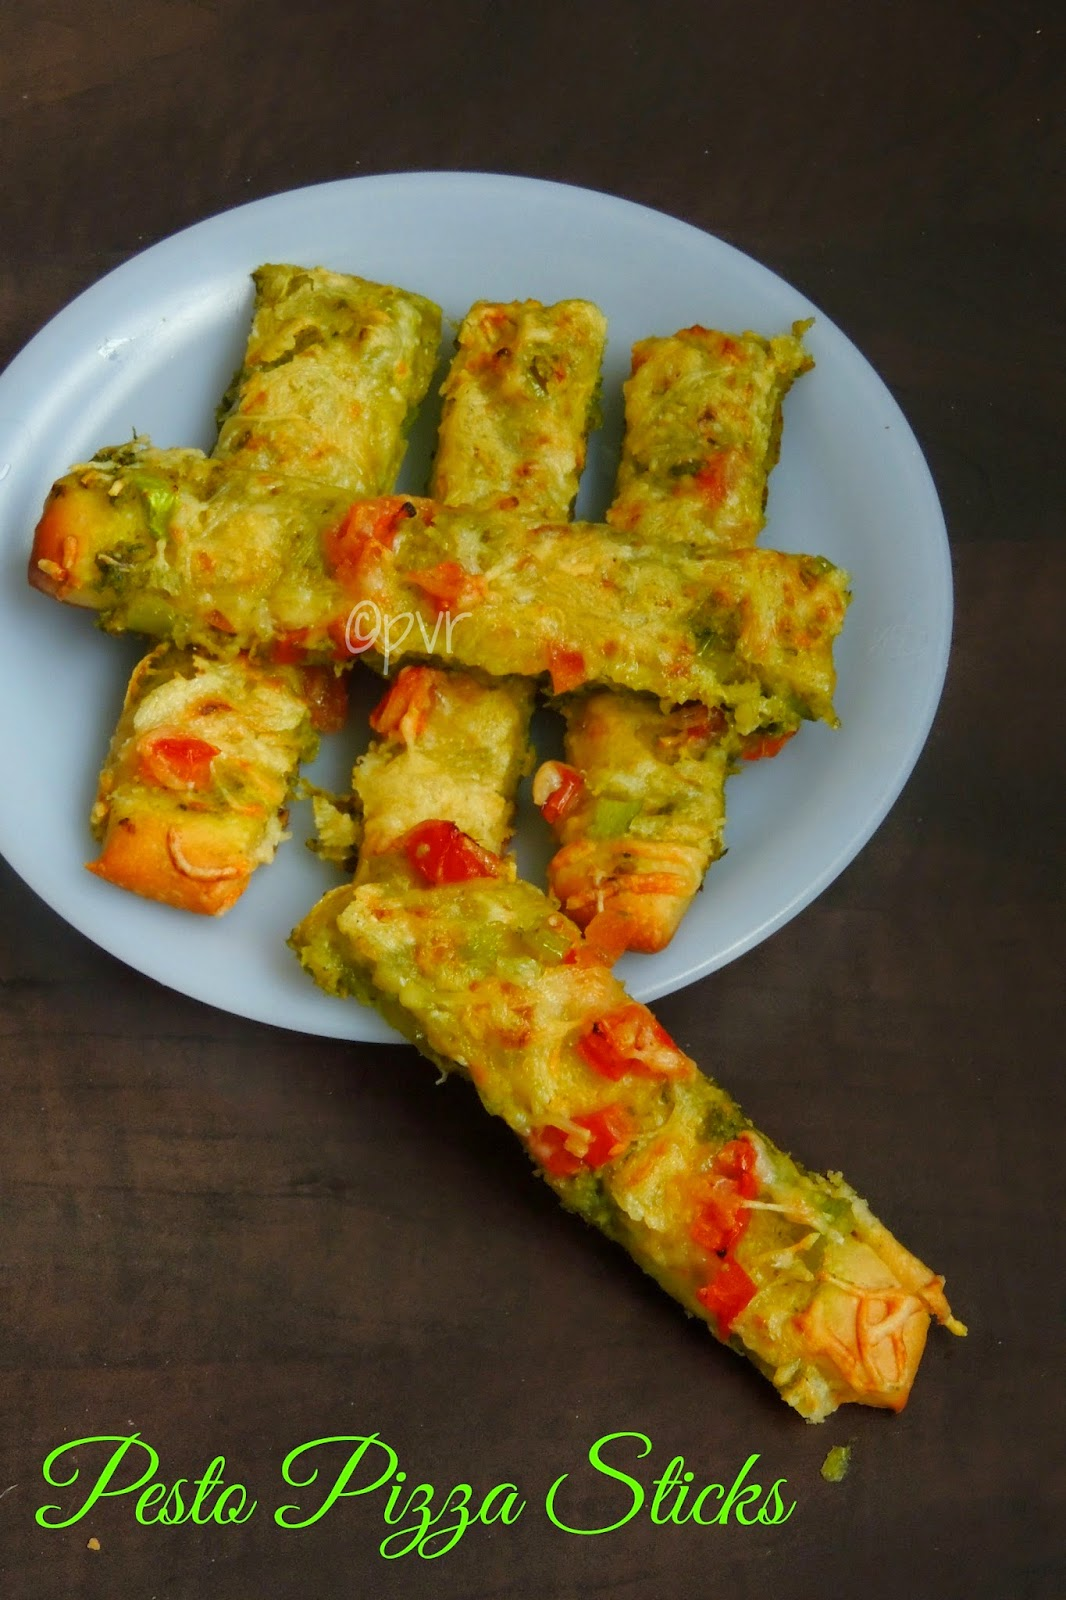 Coriander Almond pesto pizza sticks,pesto pizza sticks